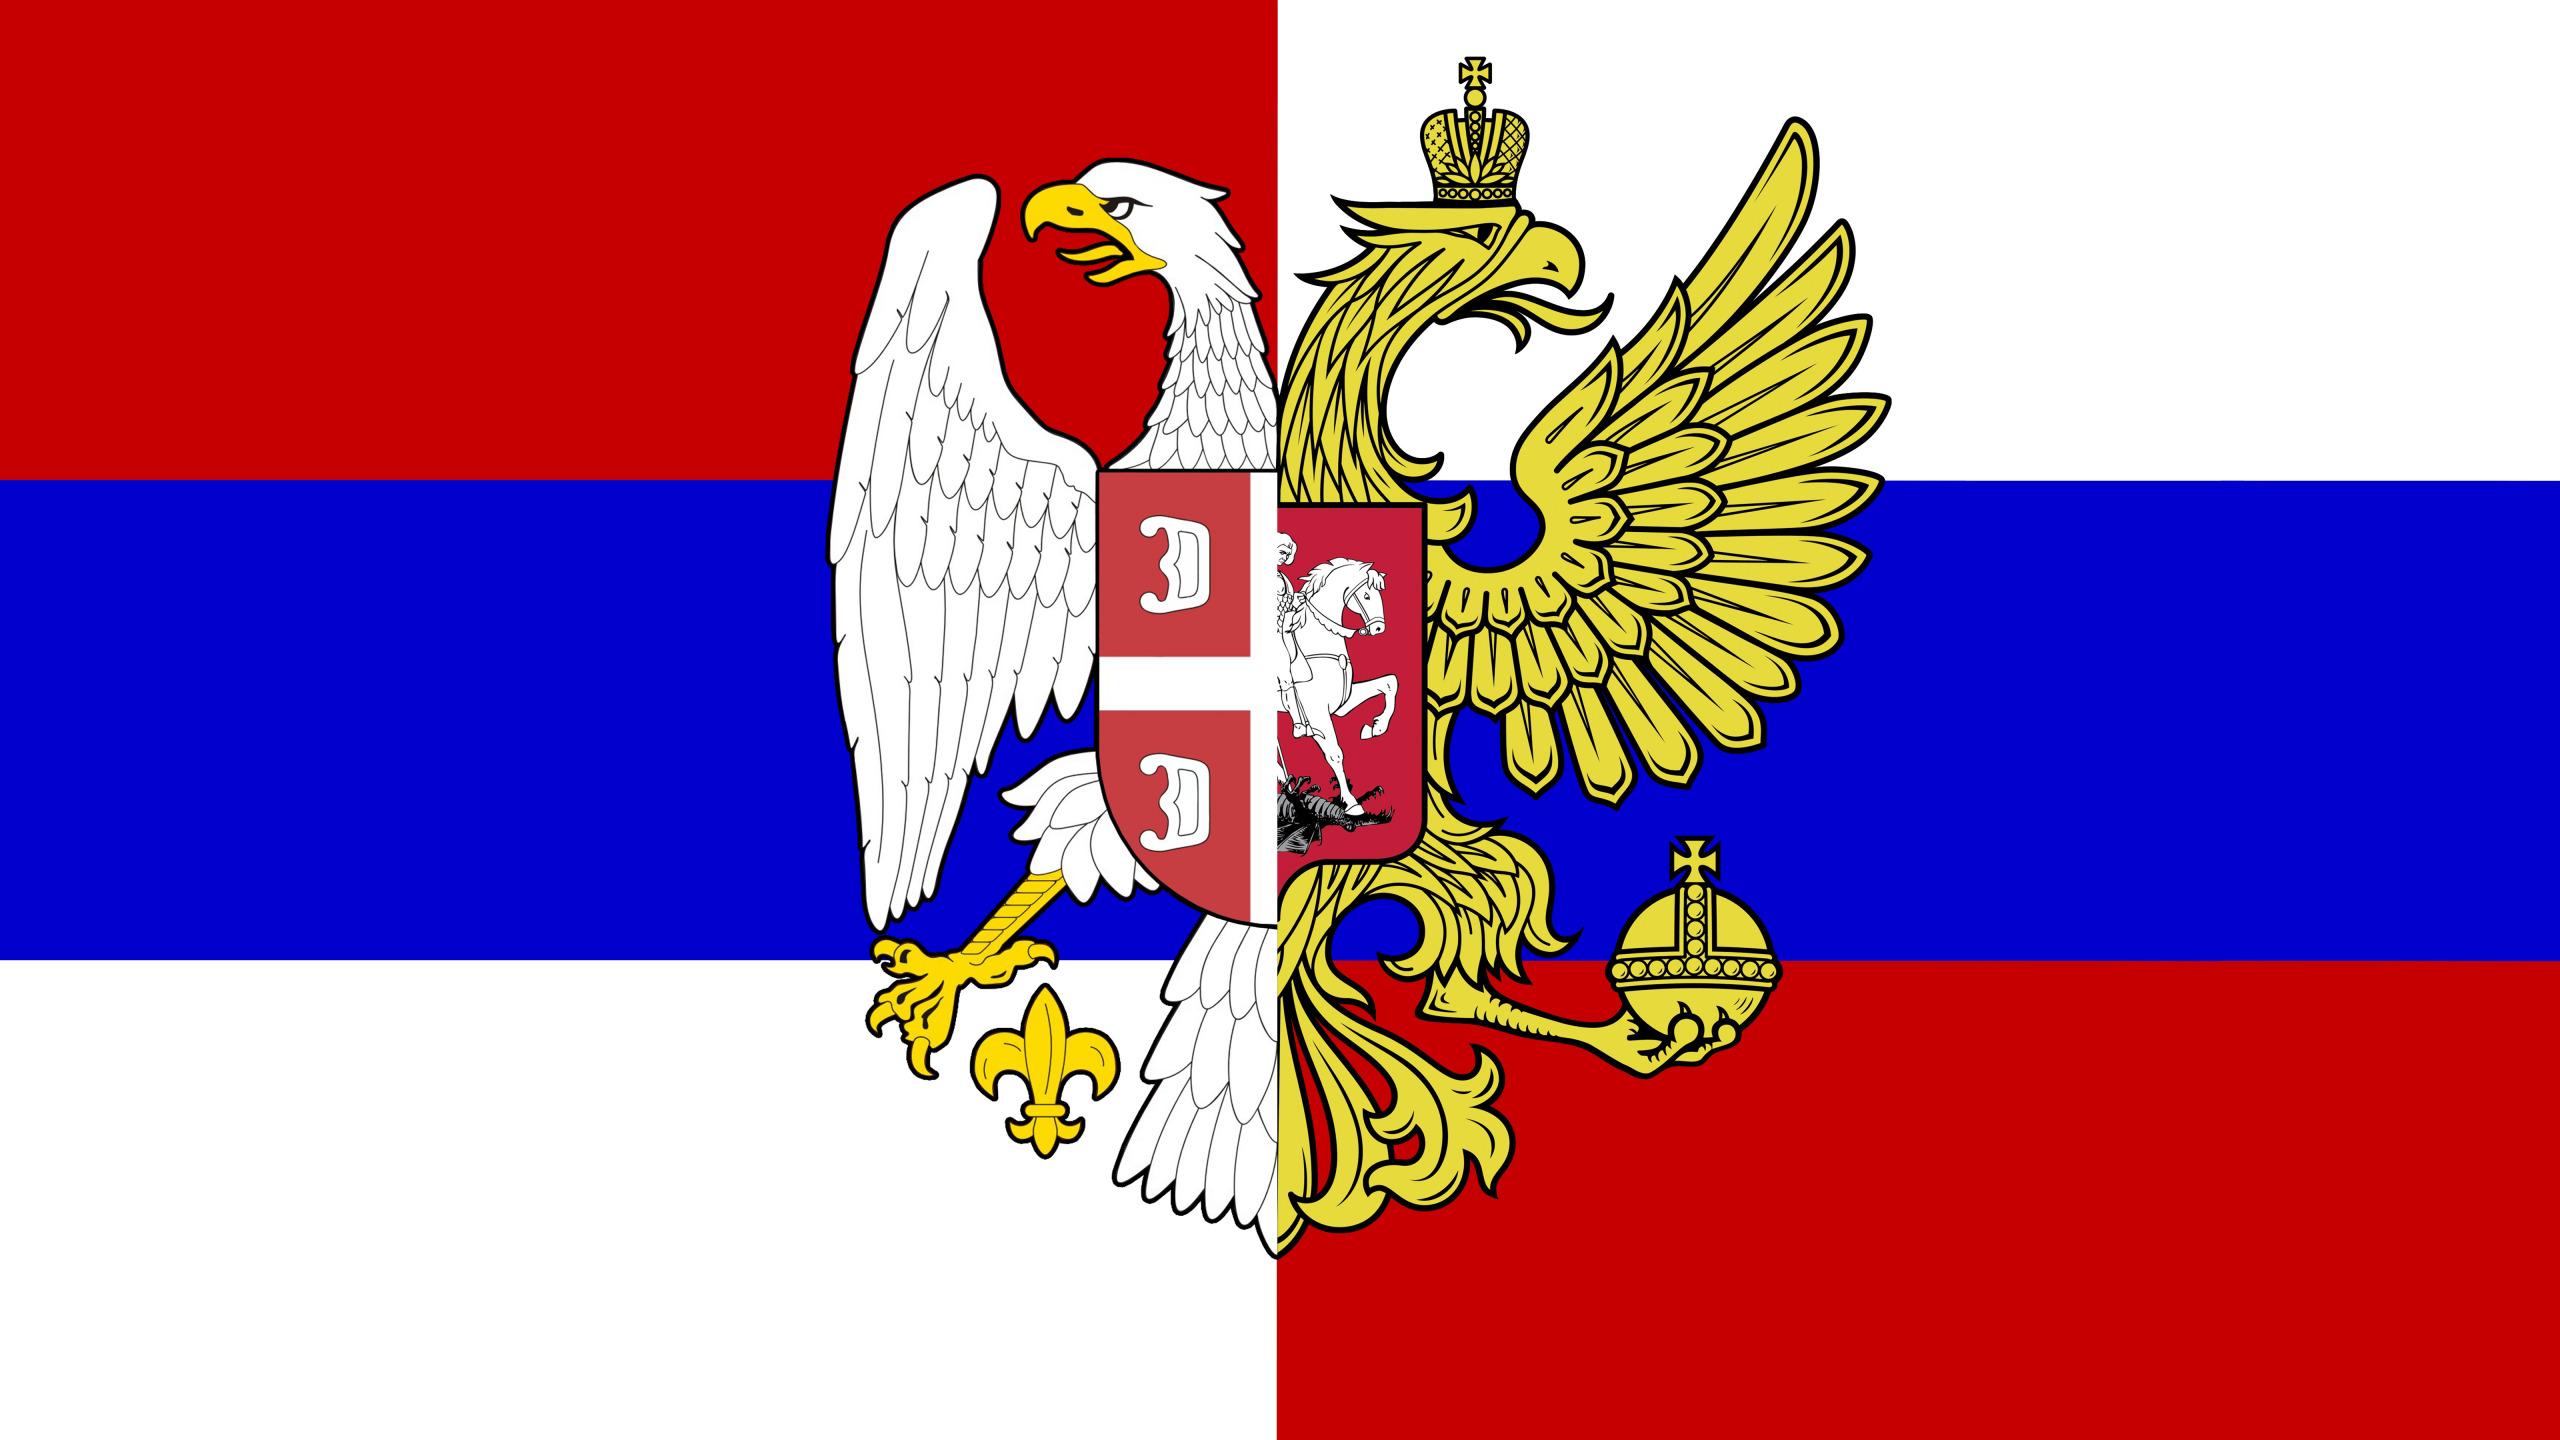 Картинки орла на флаге россии